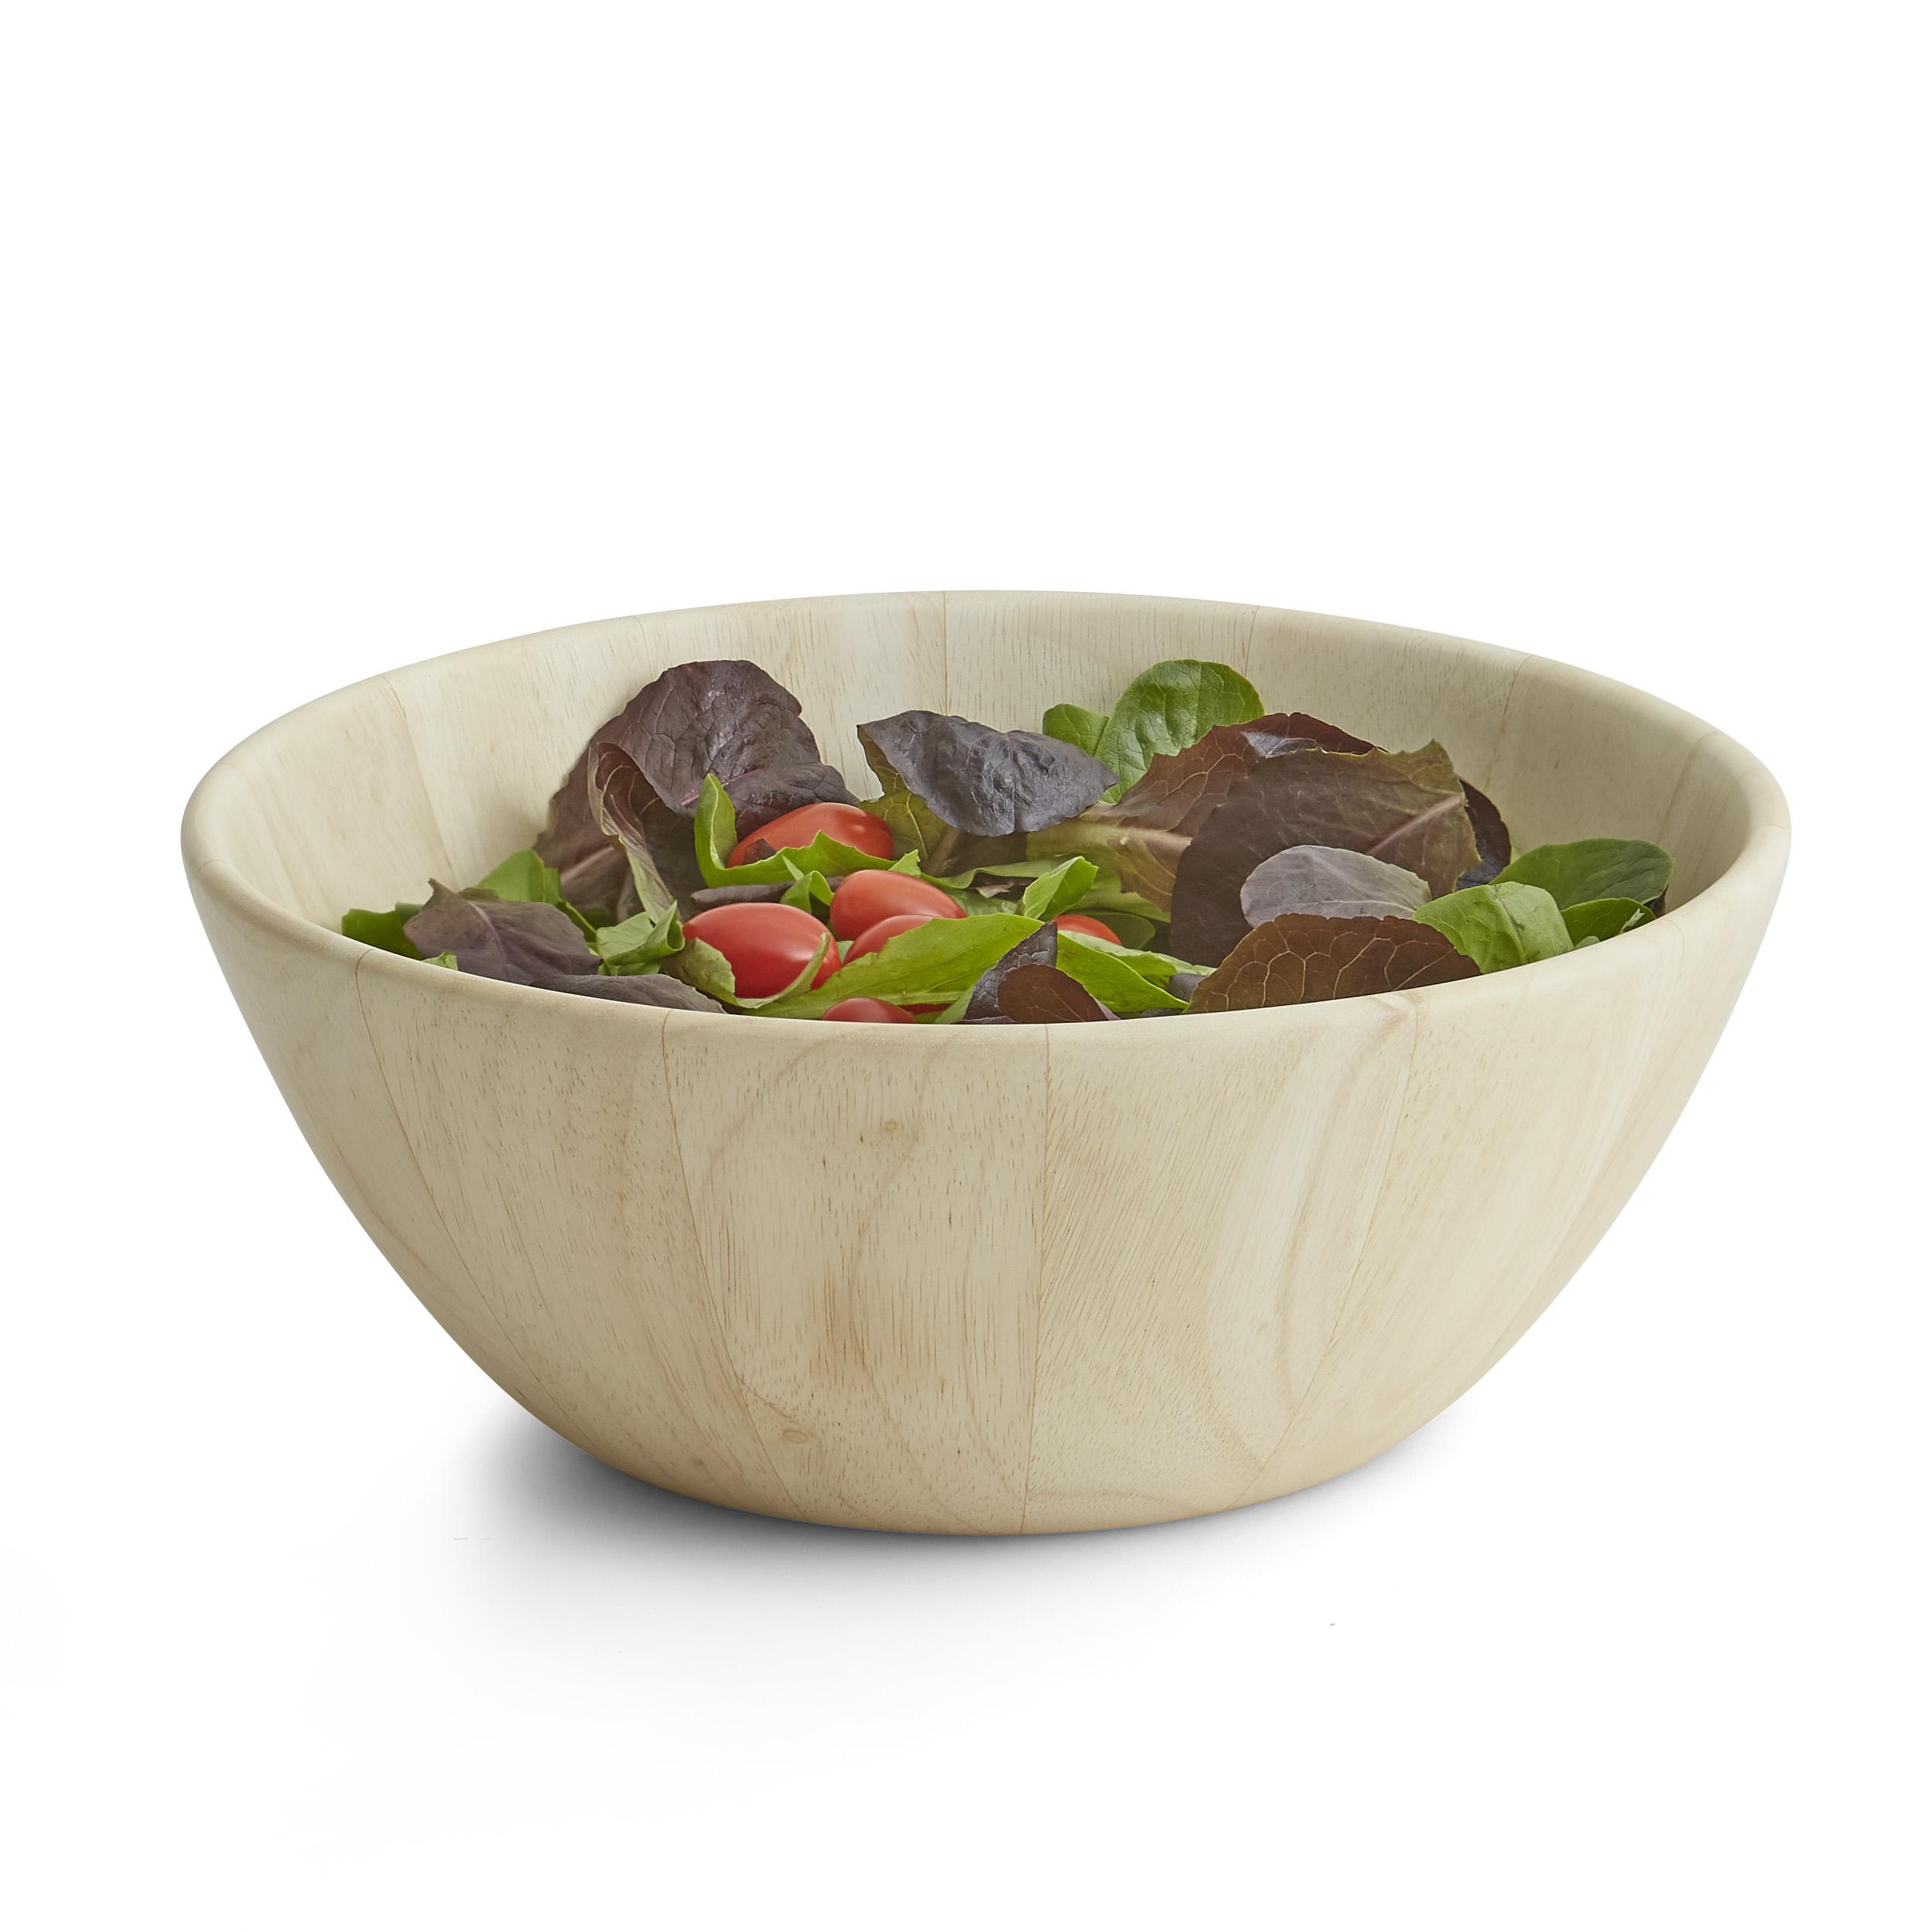 7 Pc Salad Bowl Serving Set Whitewash Wood Woodardandcharles Com